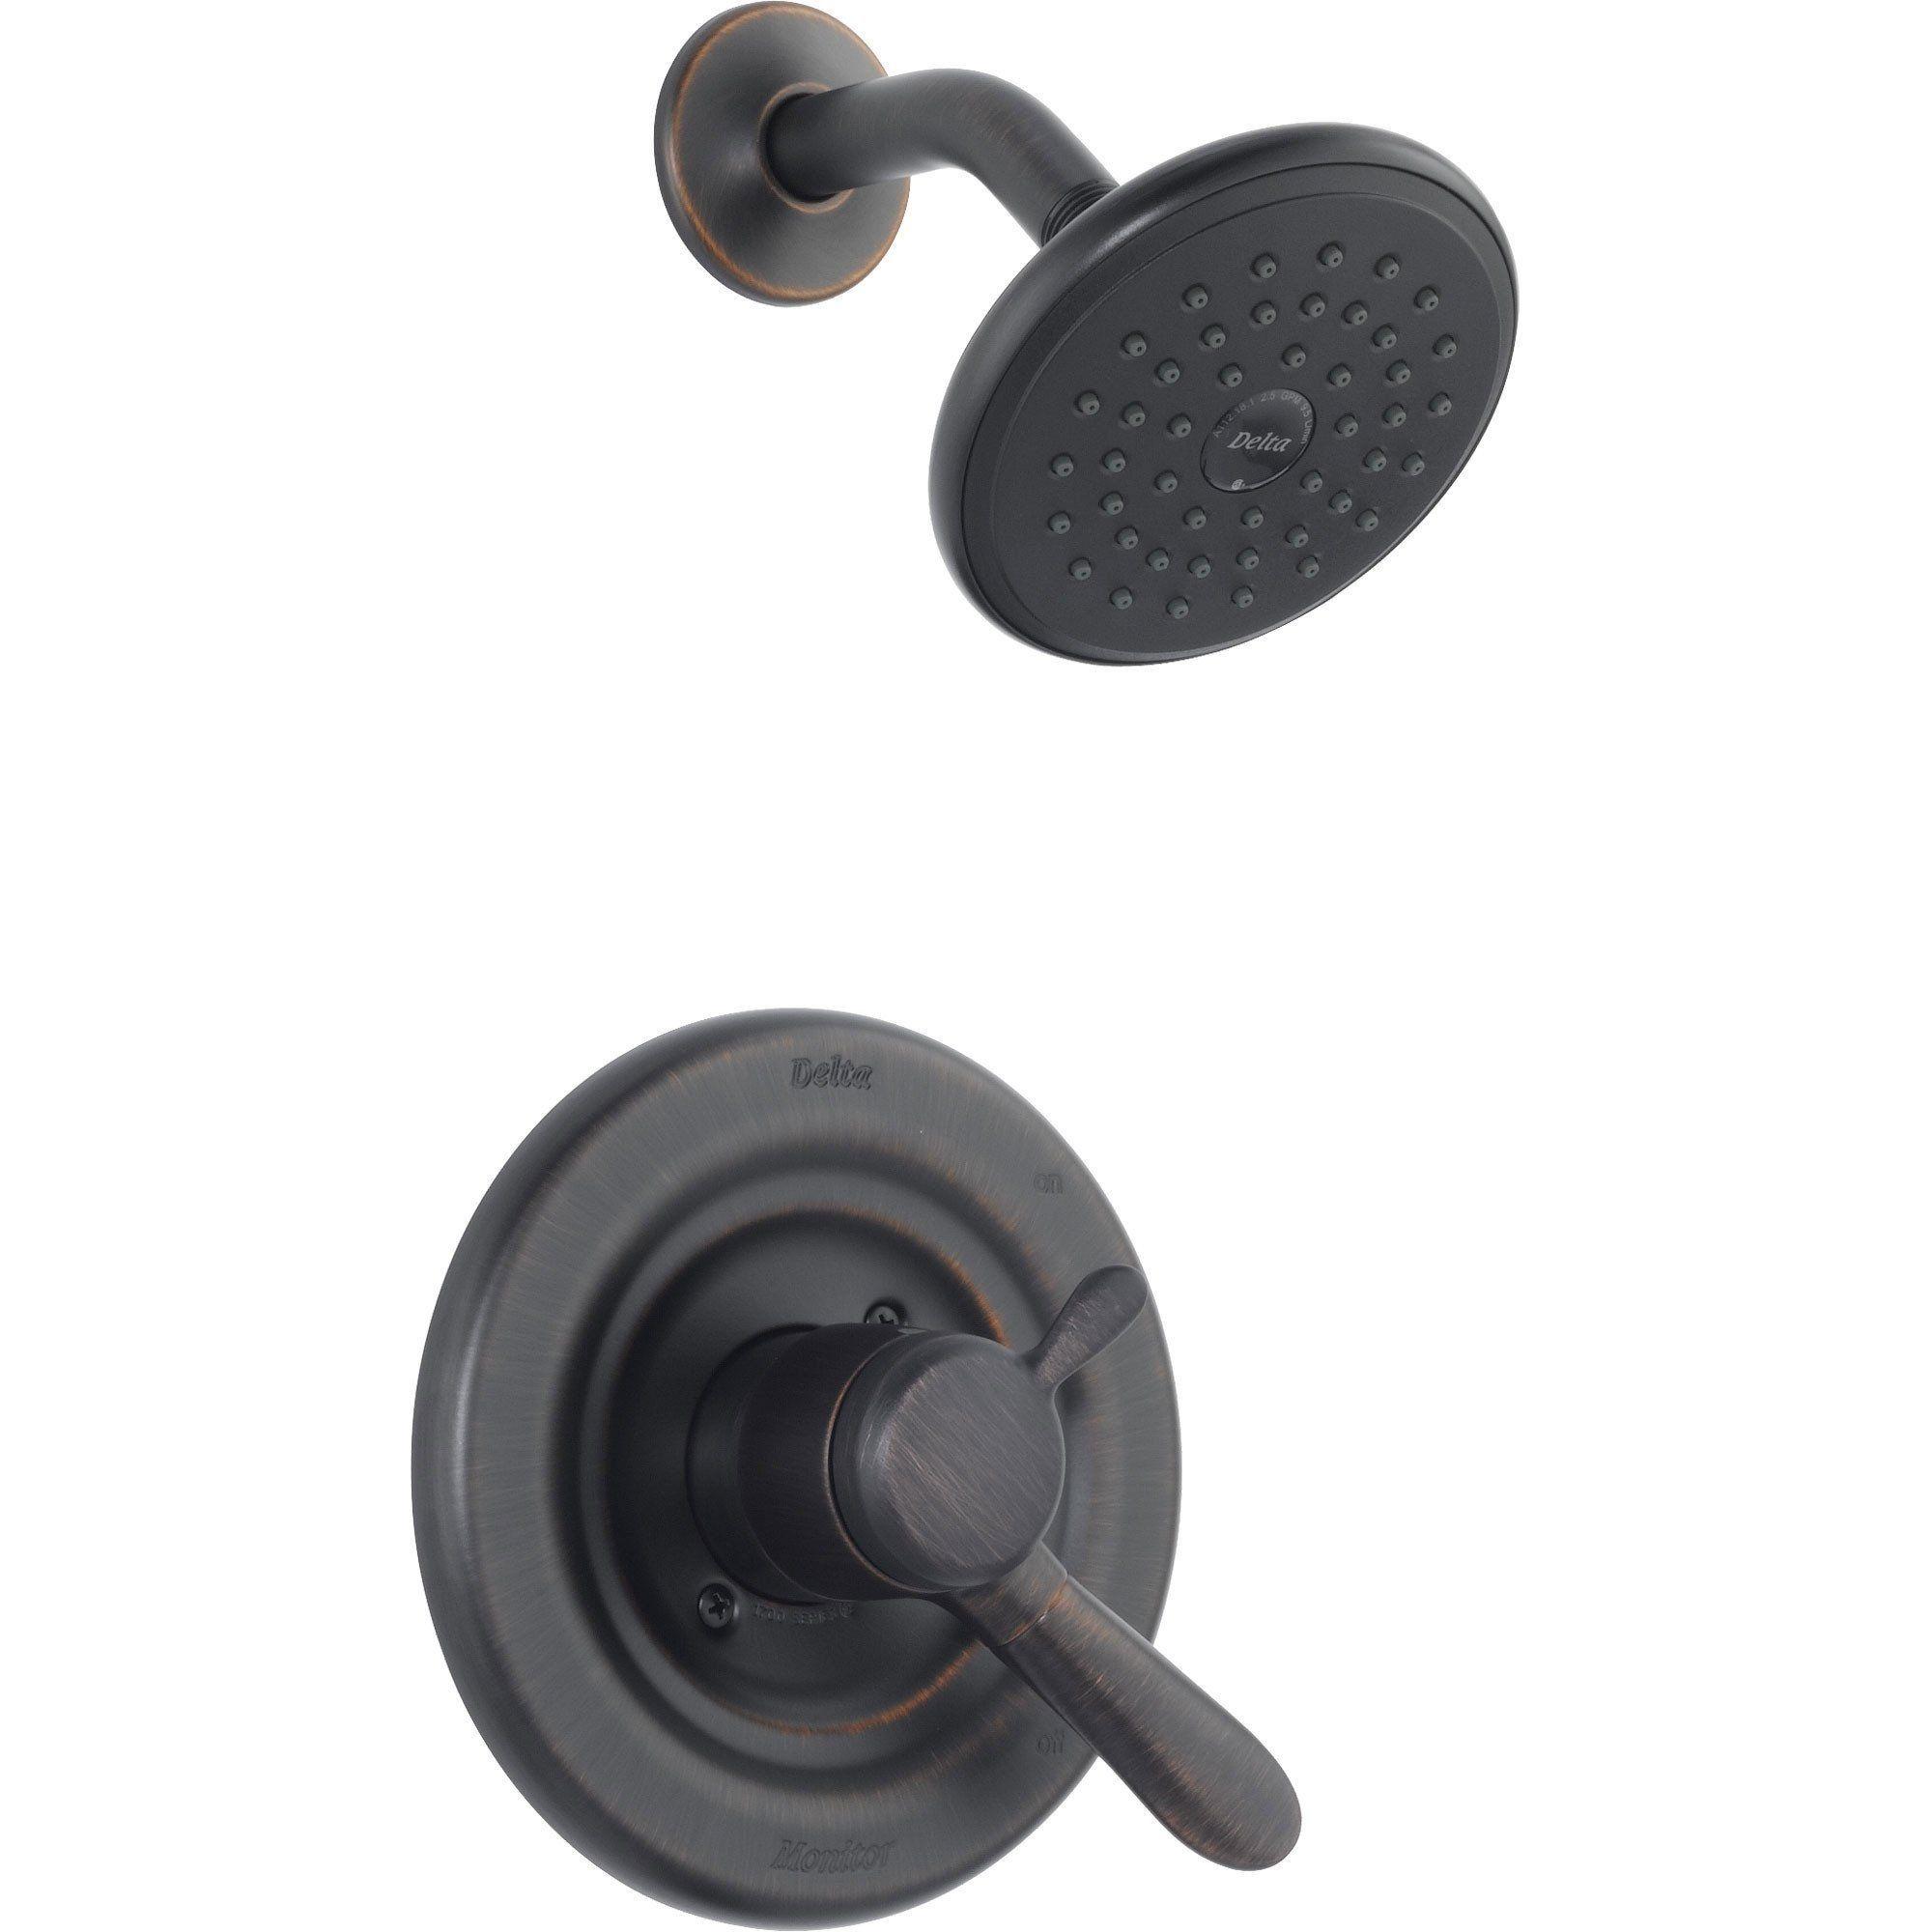 Delta Lahara Venetian Bronze Temp/Volume Control Shower Faucet with Valve D676V